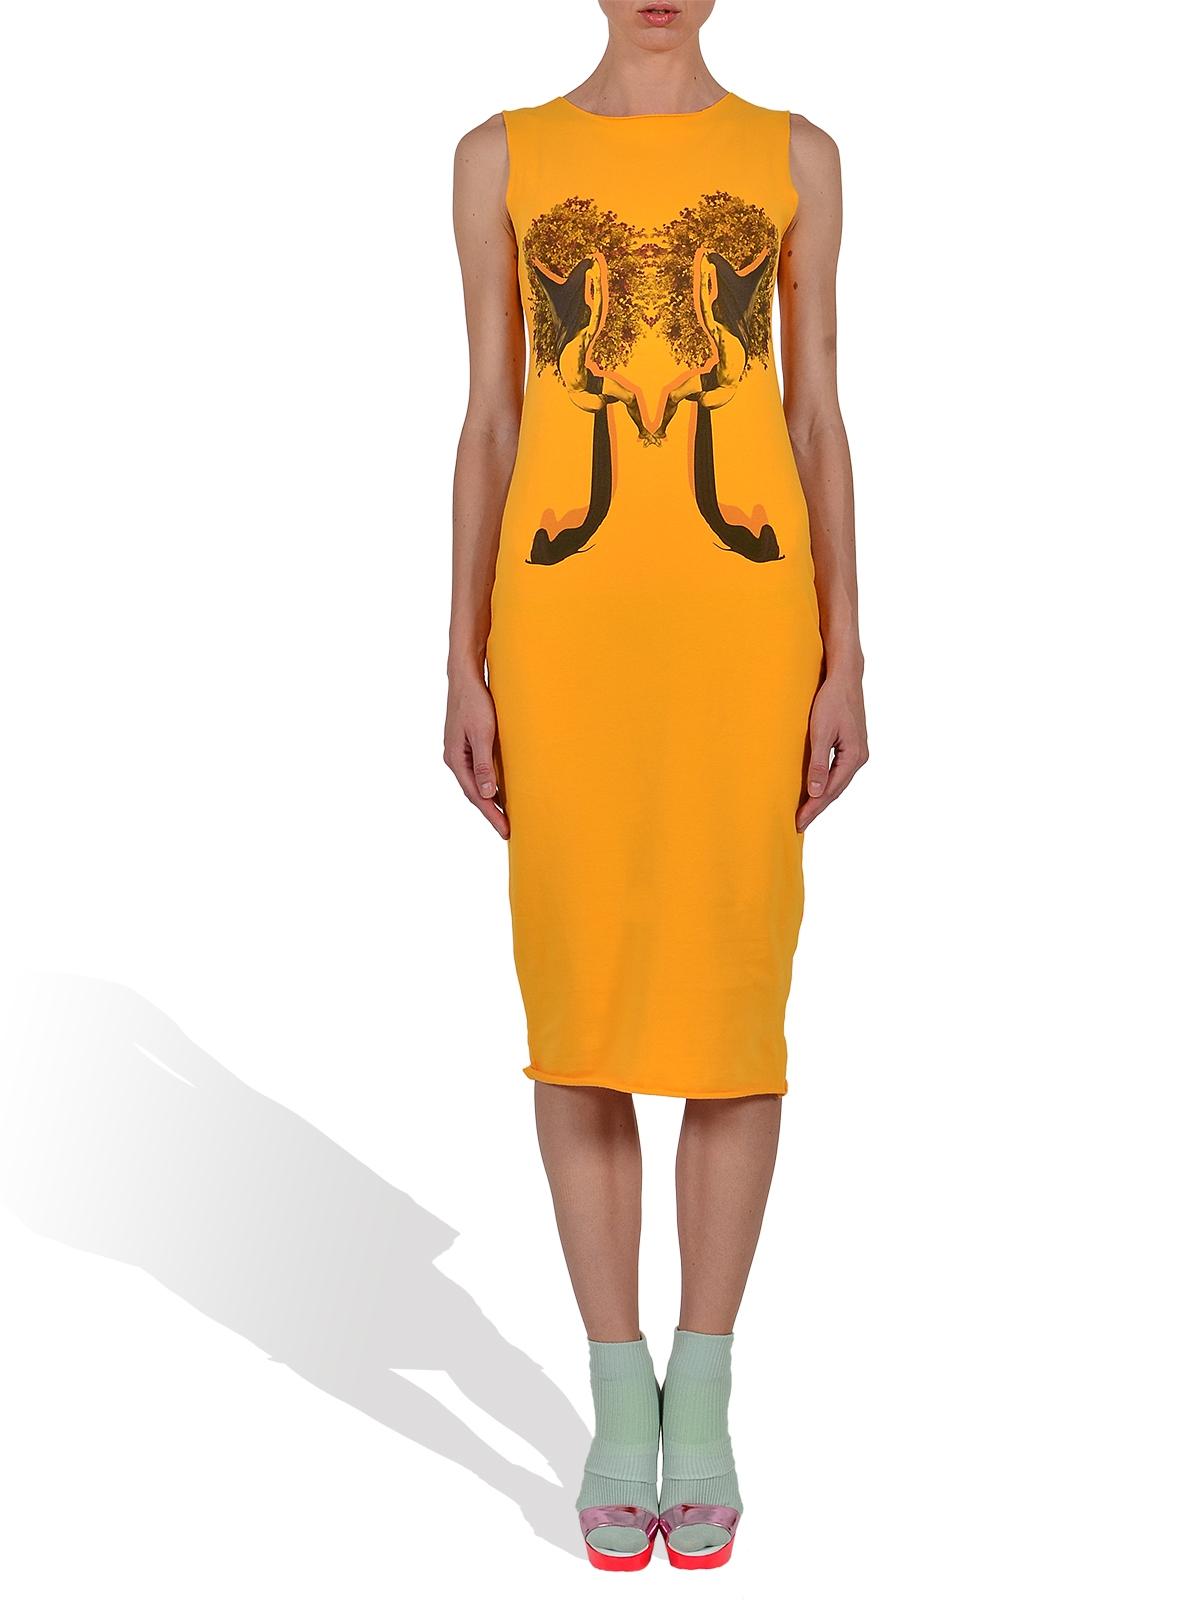 Yellow Tank Dress by LE PETIT INDIGENT